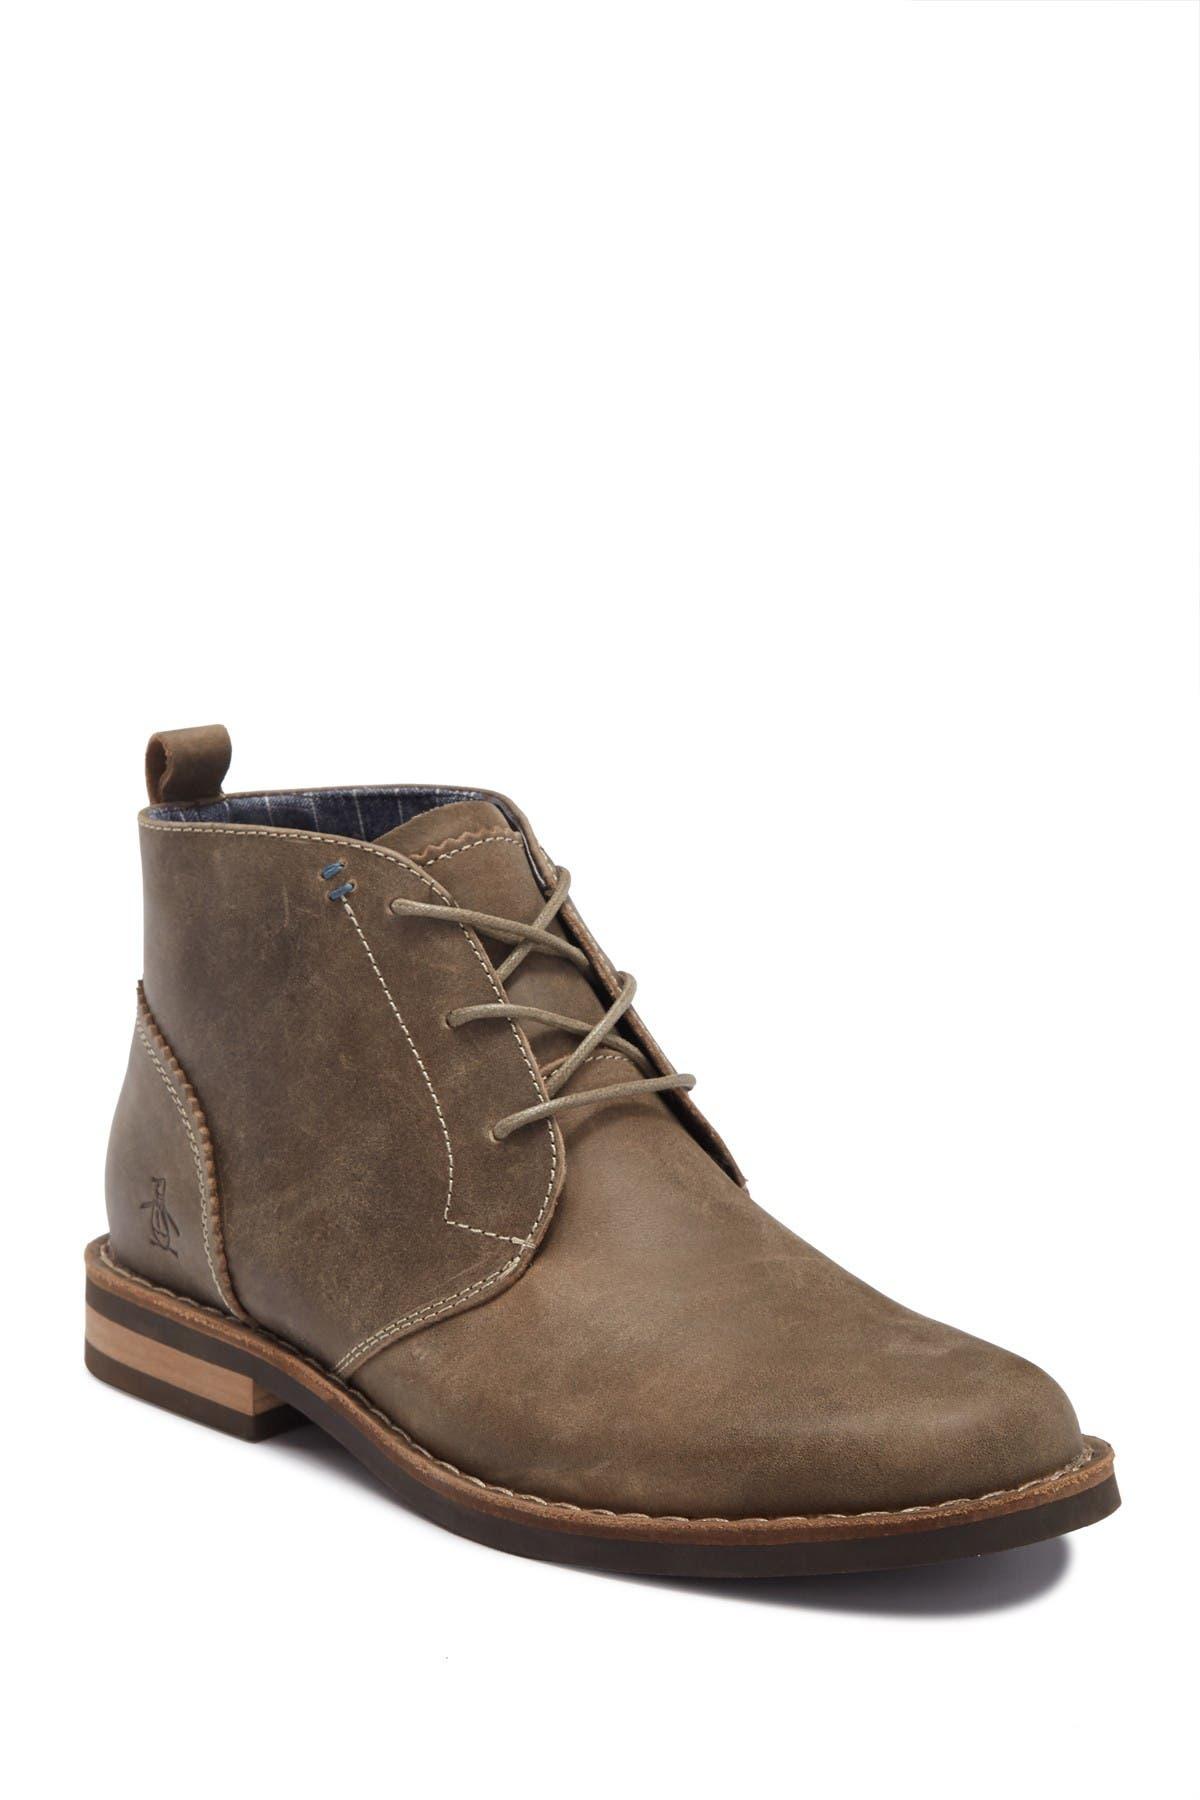 Men's Chukka Boots Clearance